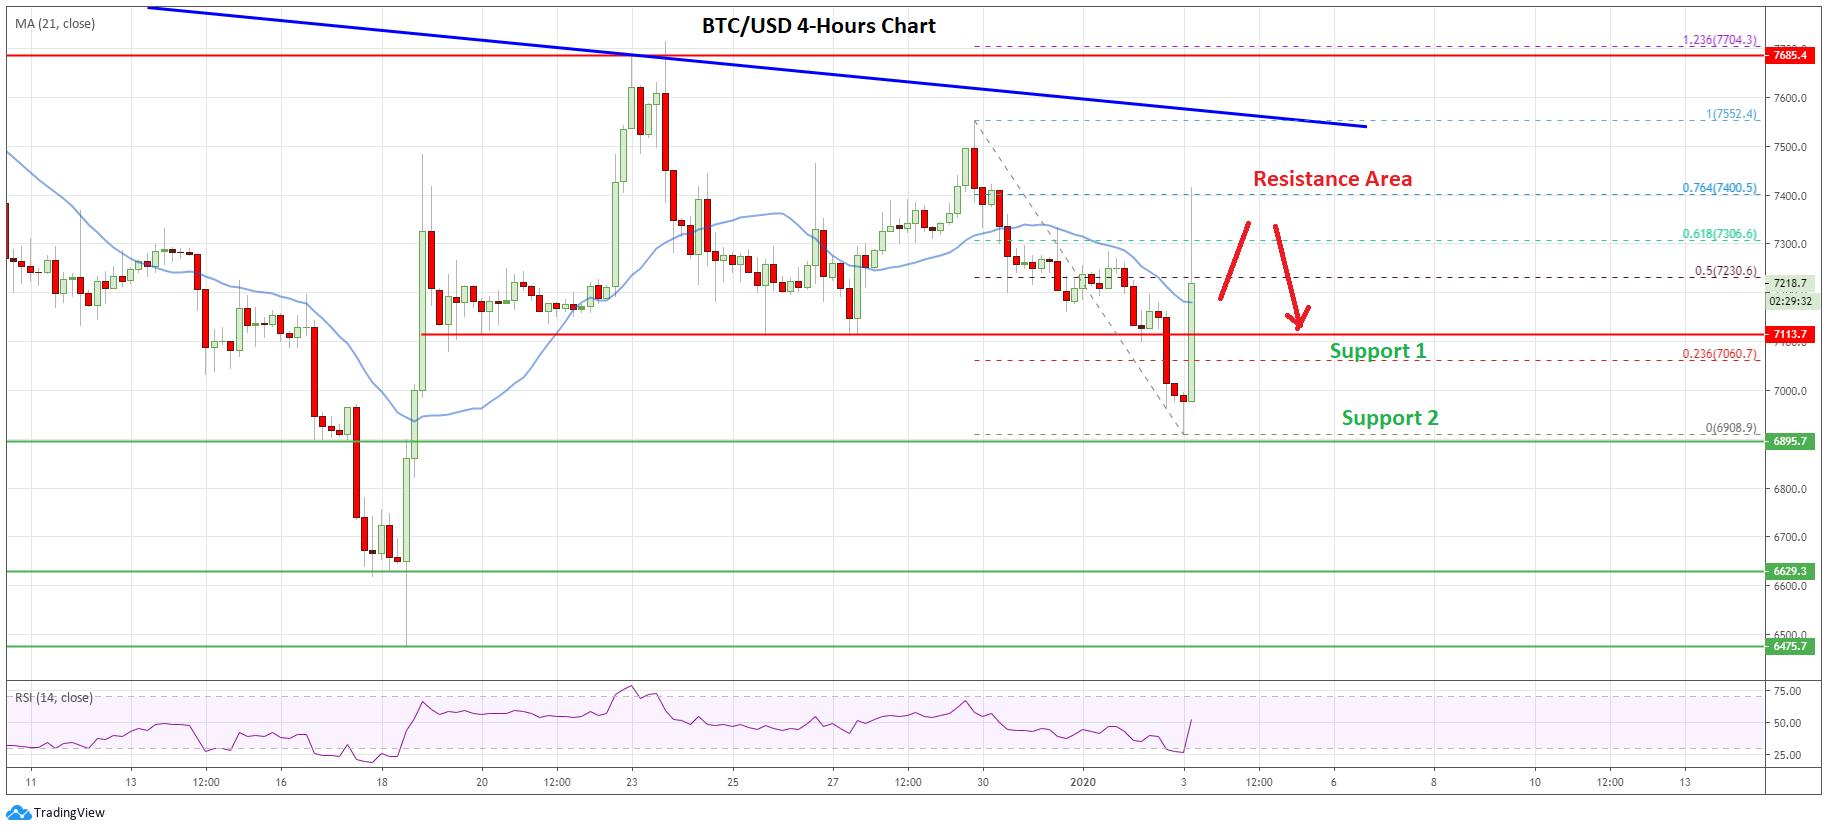 Crypto Market Update: Bitcoin, Ethereum, EOS & Litecoin Price Analysis 3rd Jan